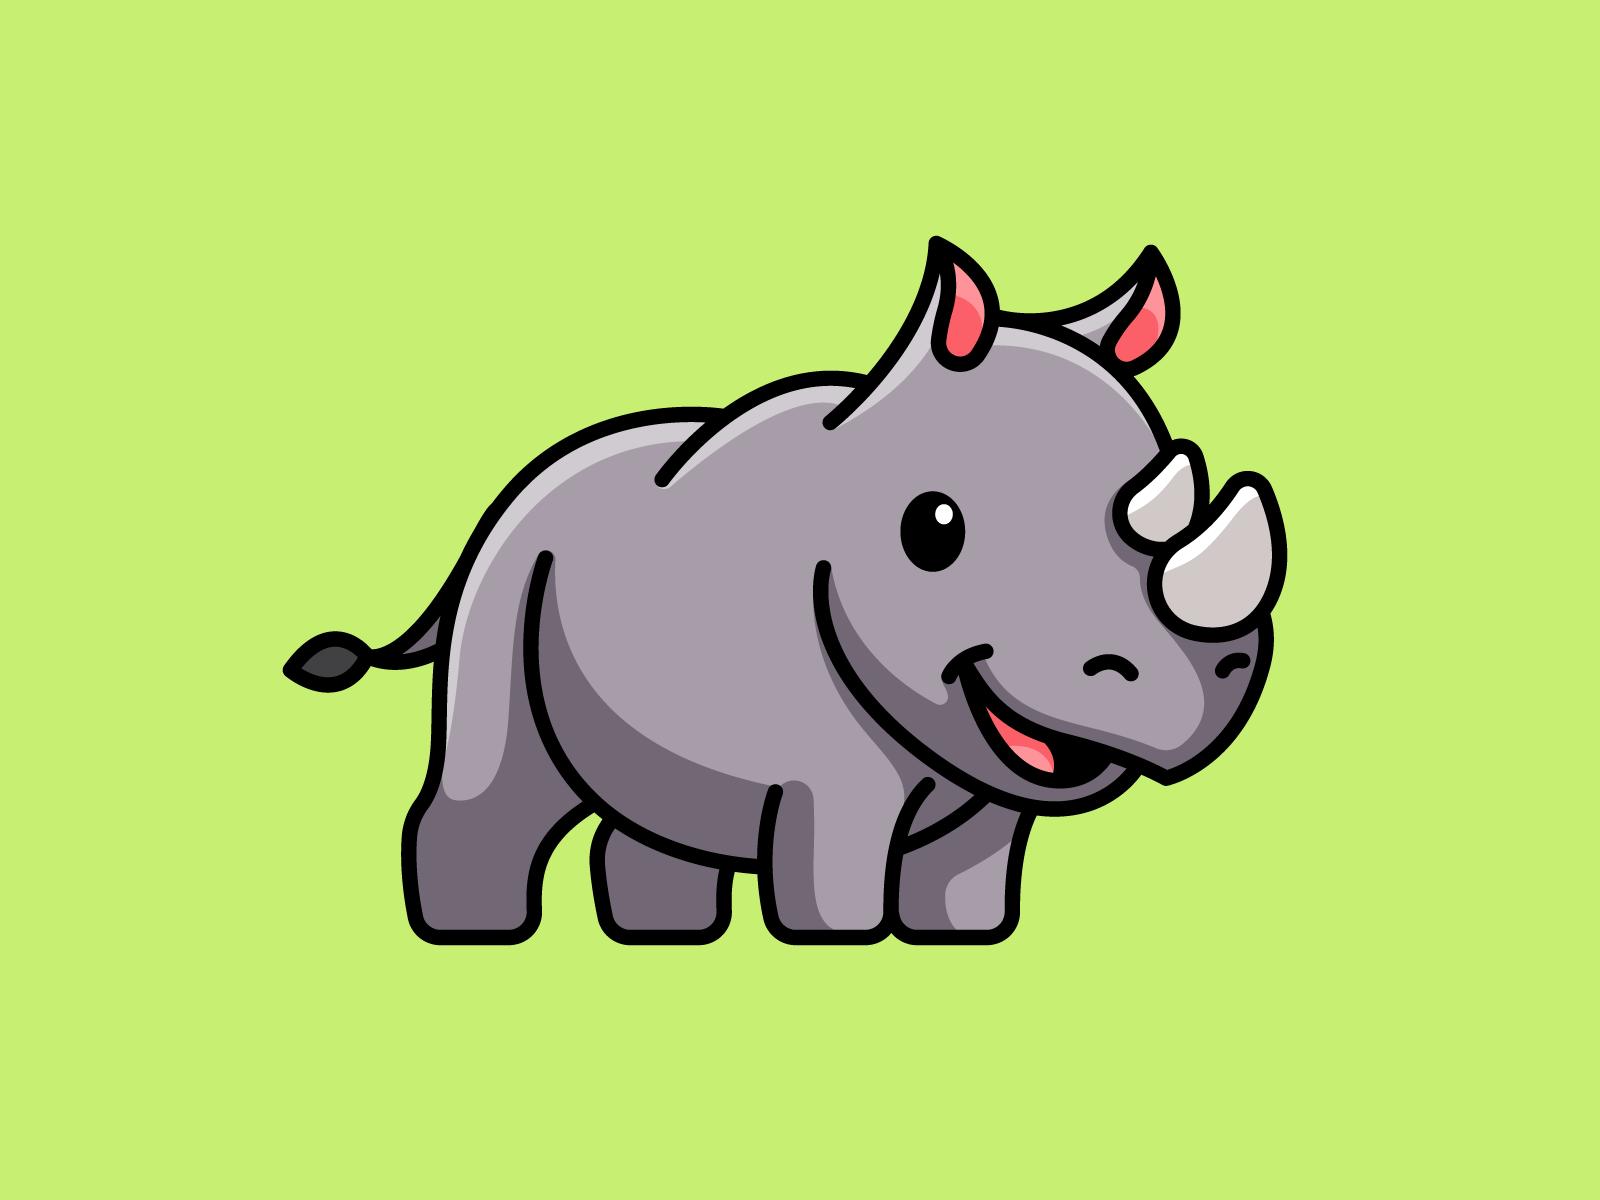 Rhino Rhino Art Rhino Illustration Funny Cartoon Characters